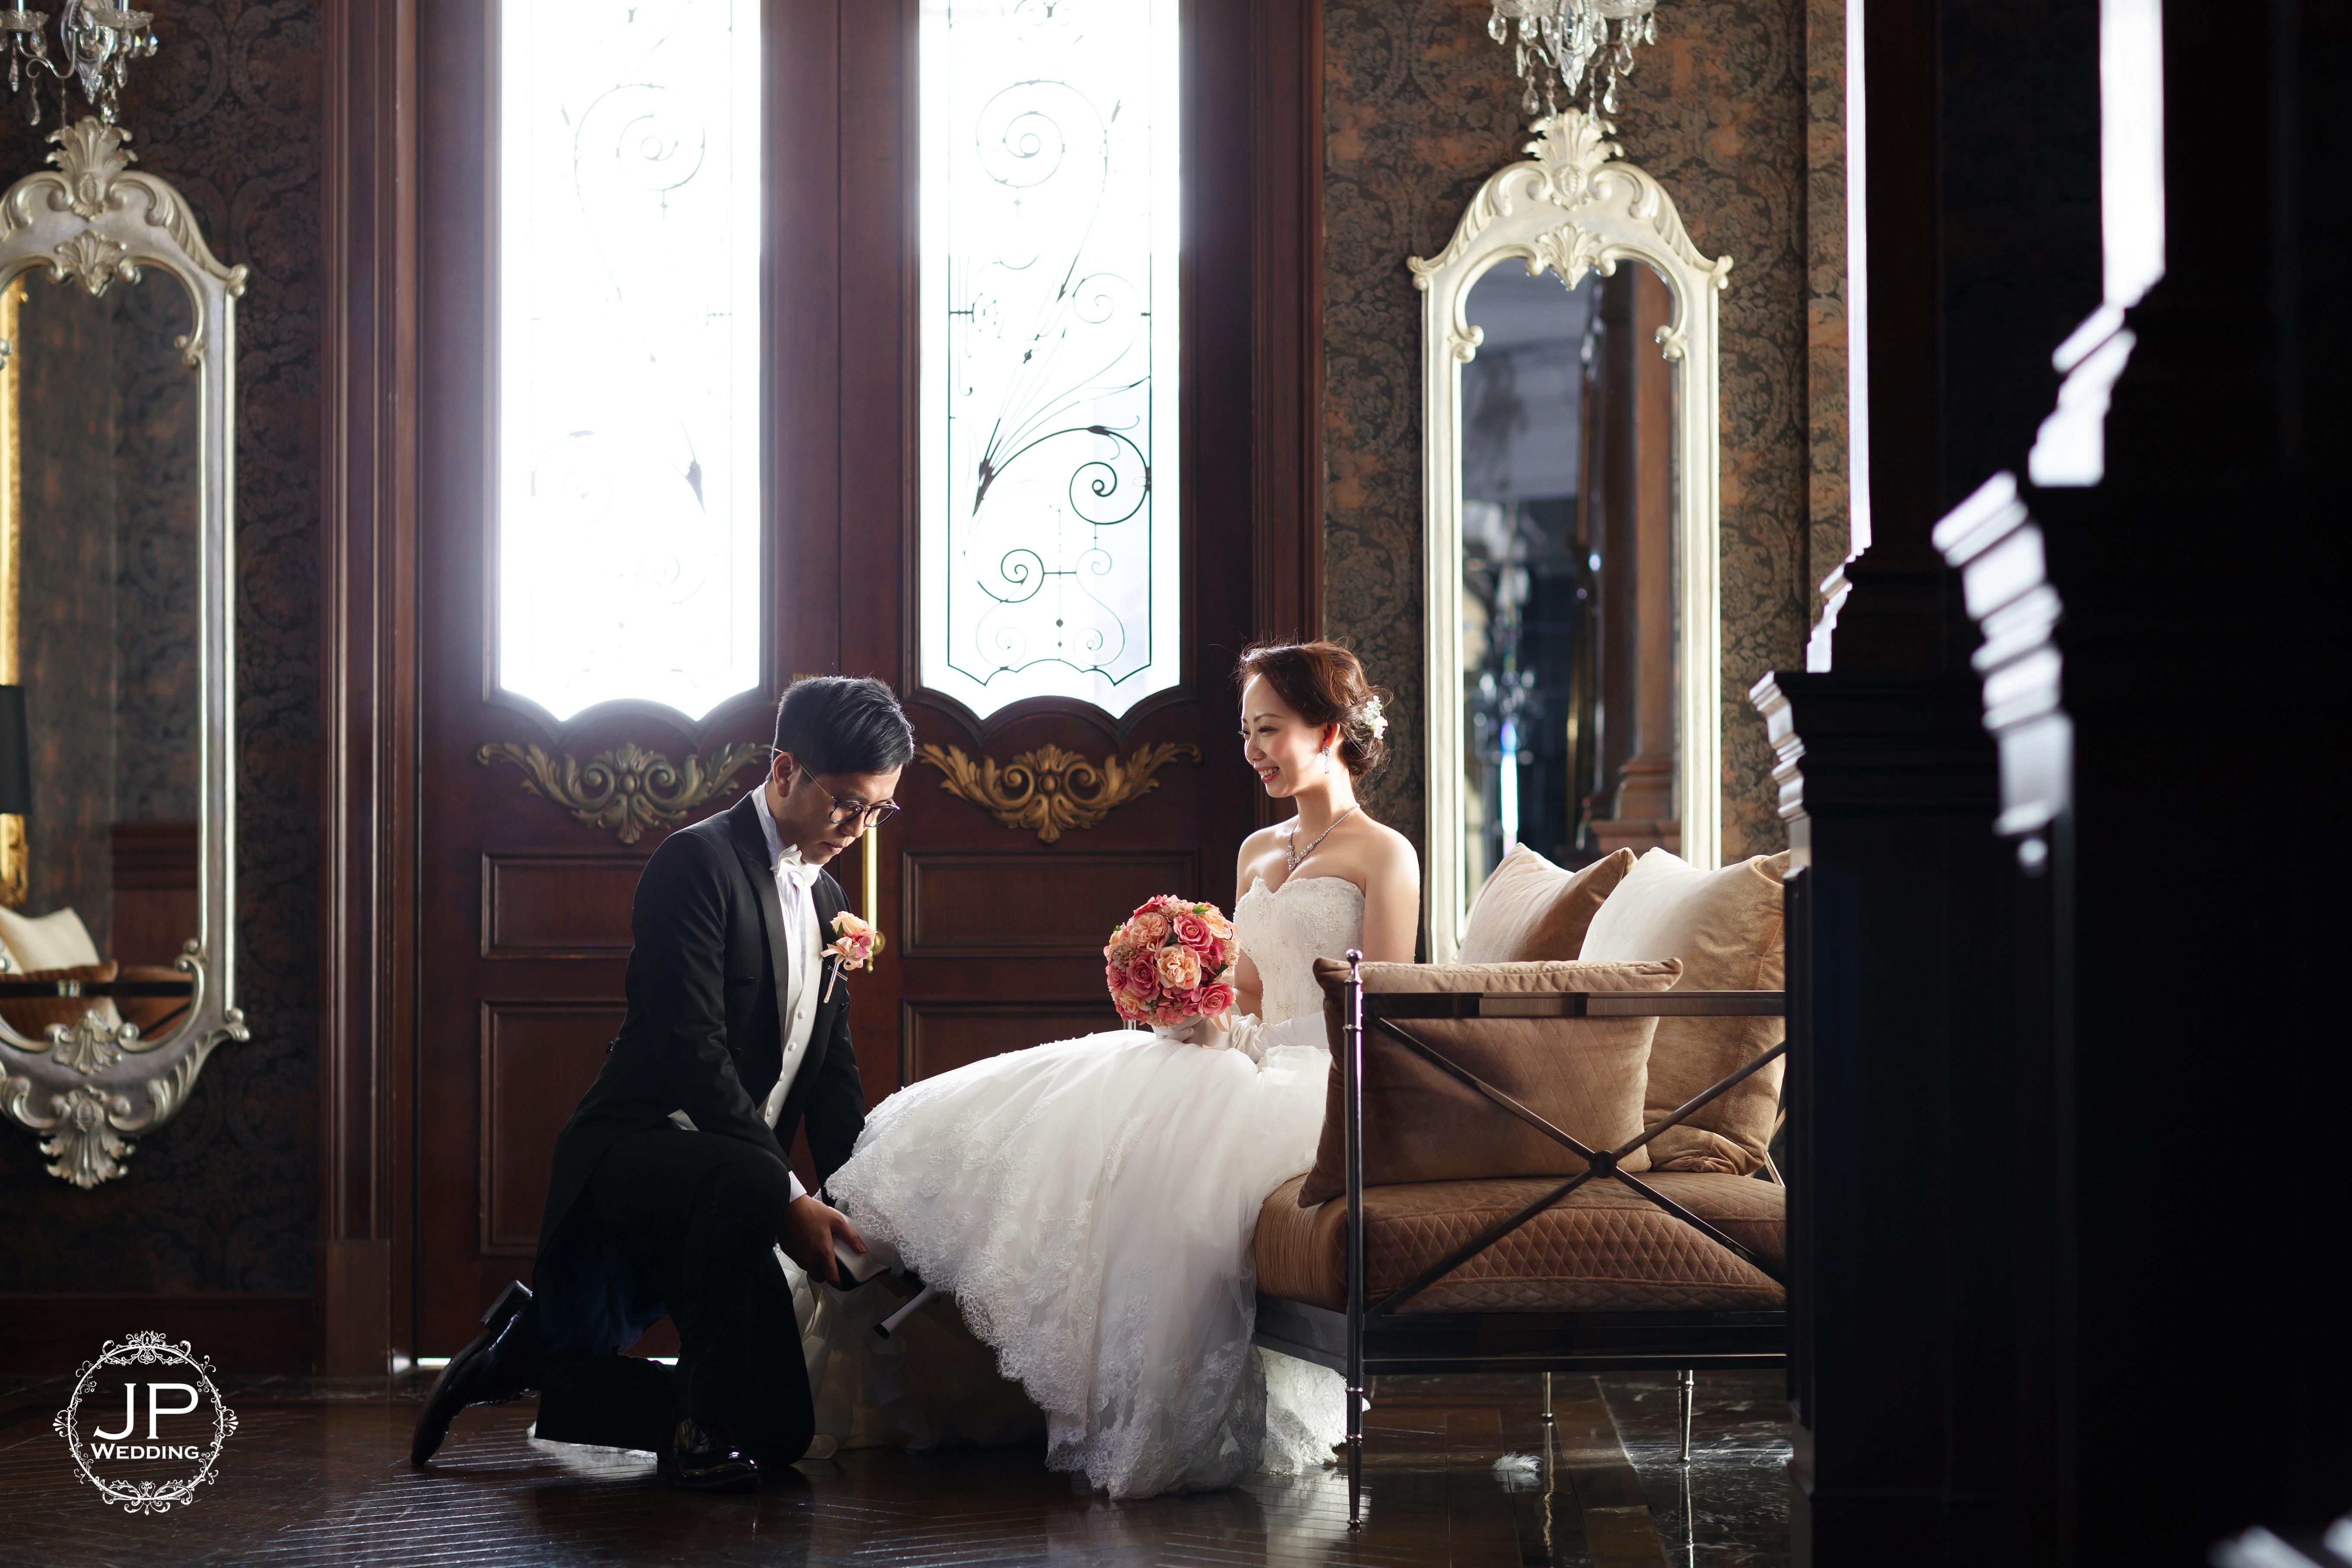 JP Wedding HK, Nagoya Glastonia 2018-5